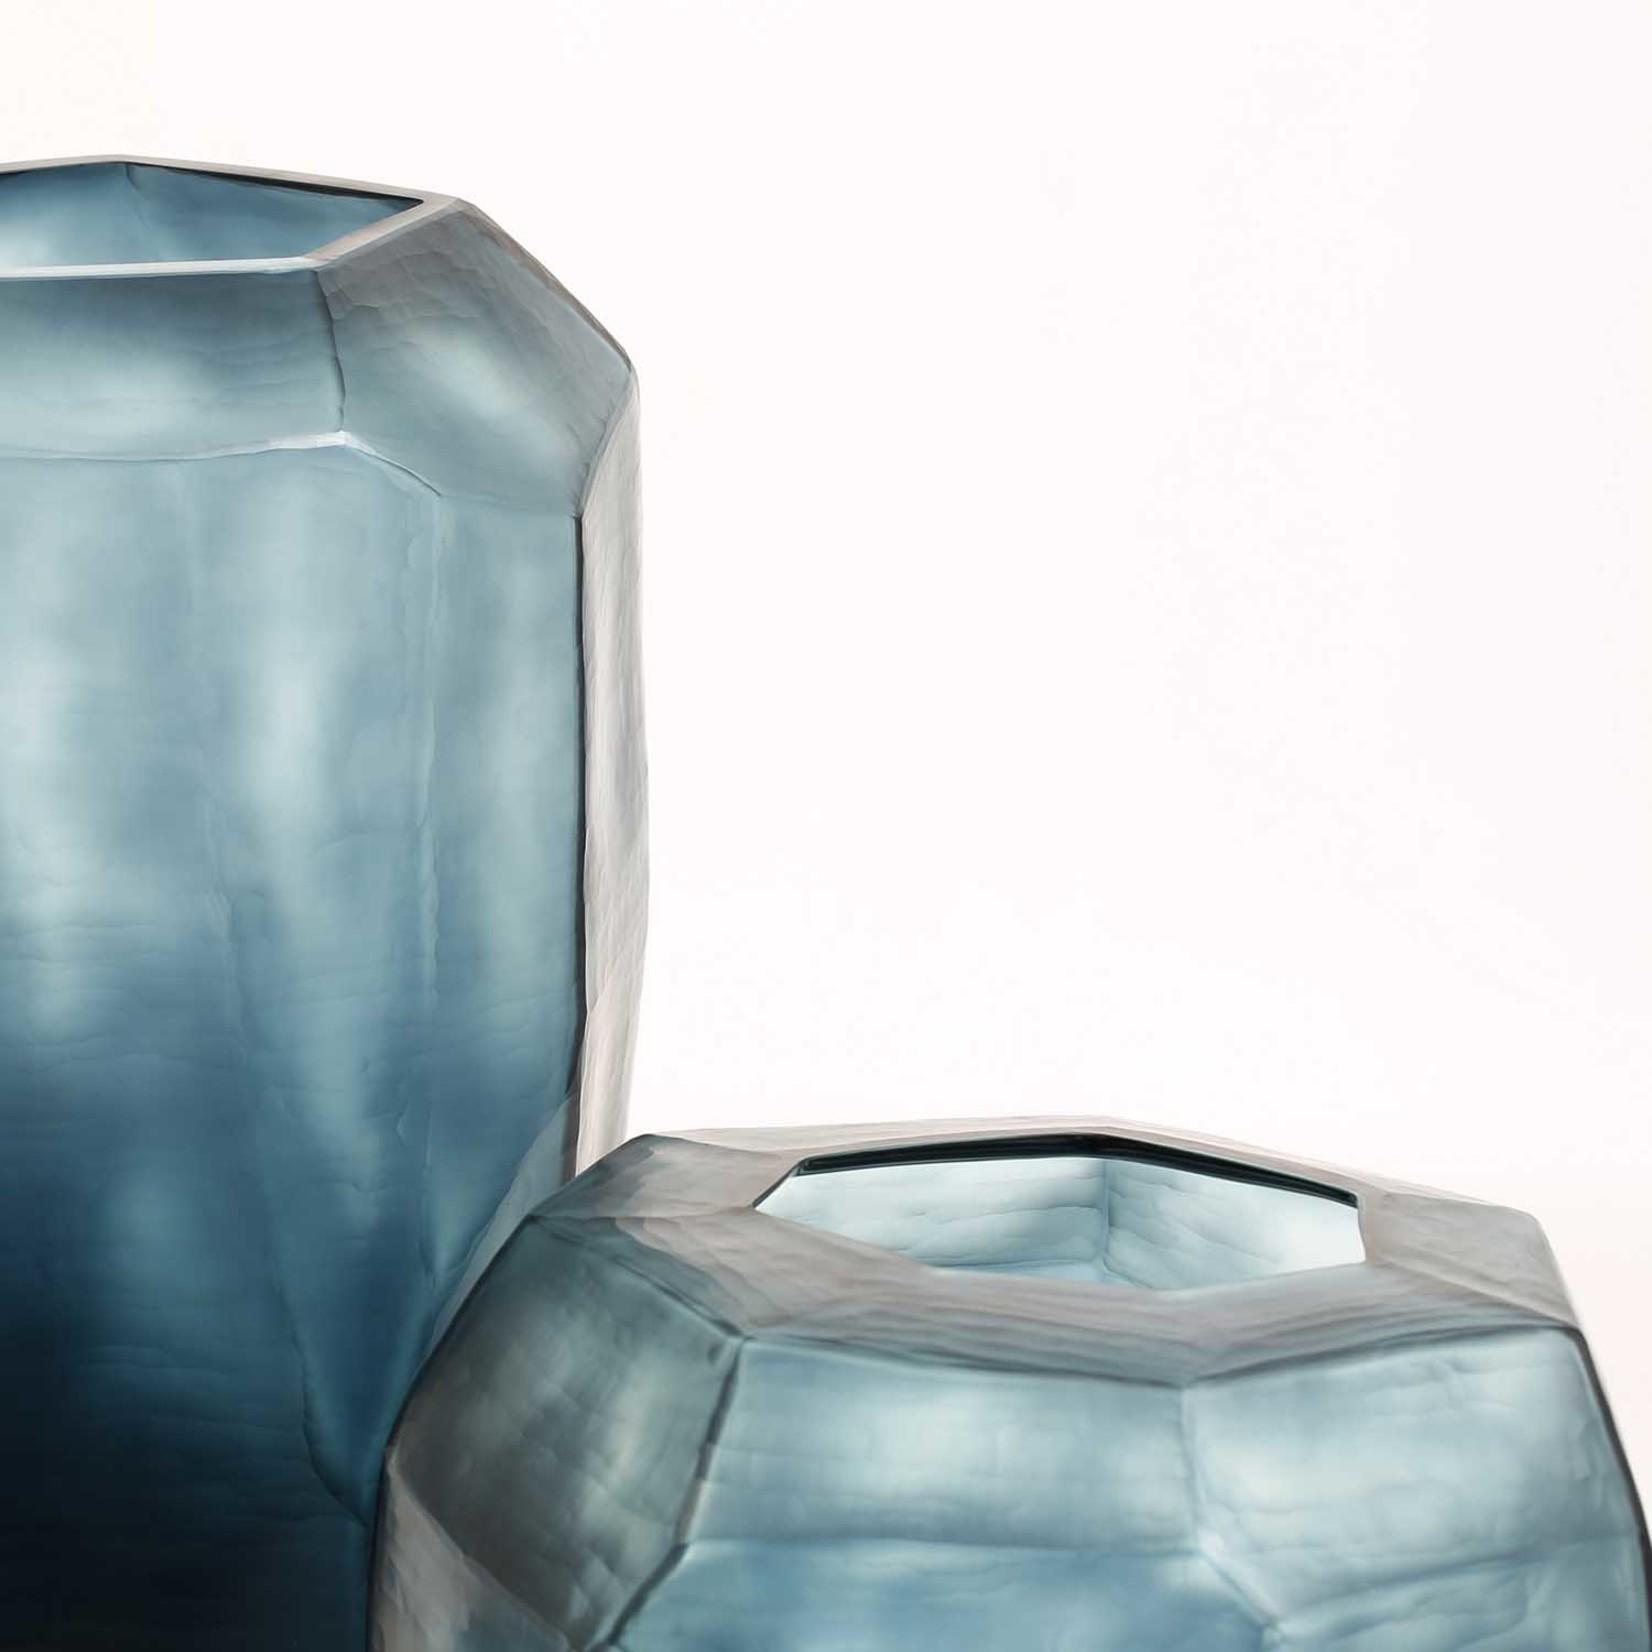 Guaxs Vase Cubistic Tall   Ocean Blue / Indigo